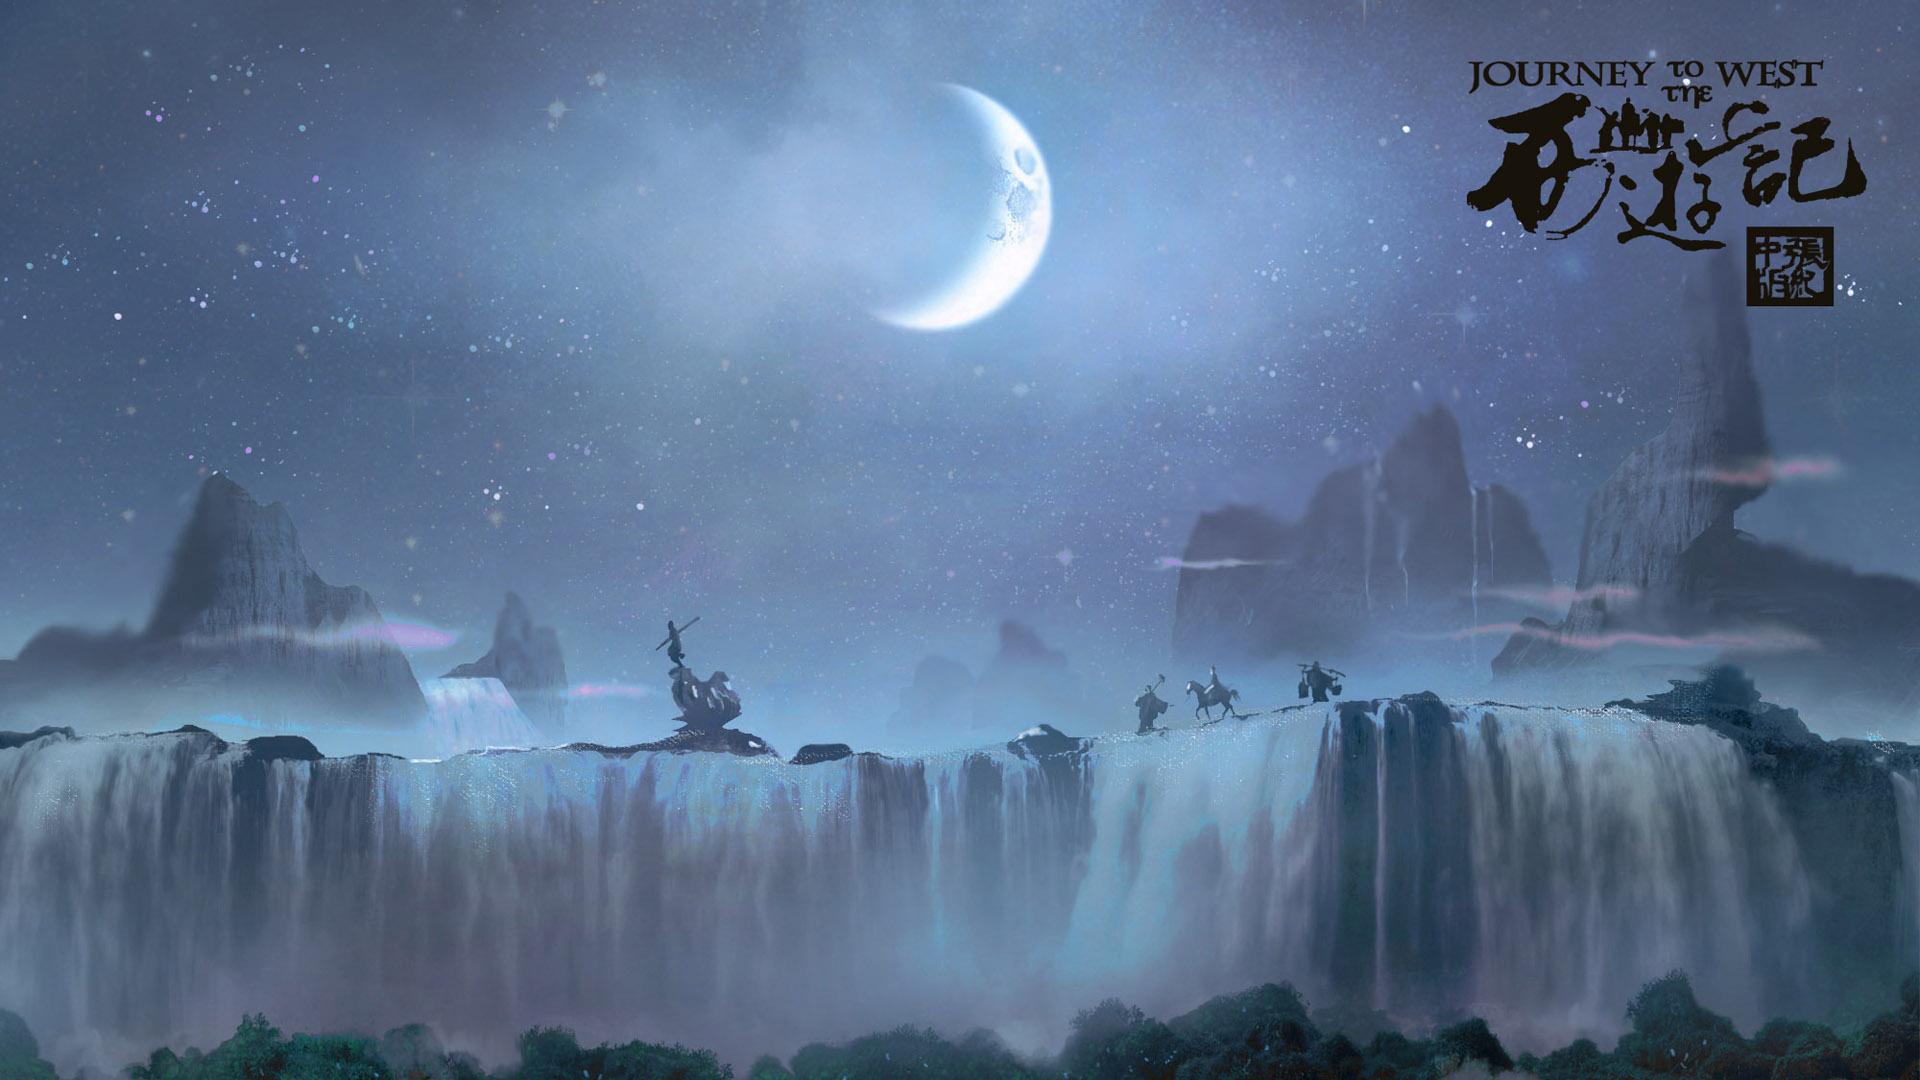 New Journey To The West Hd Wallpaper Princess Mononoke Night 533960 Hd Wallpaper Backgrounds Download